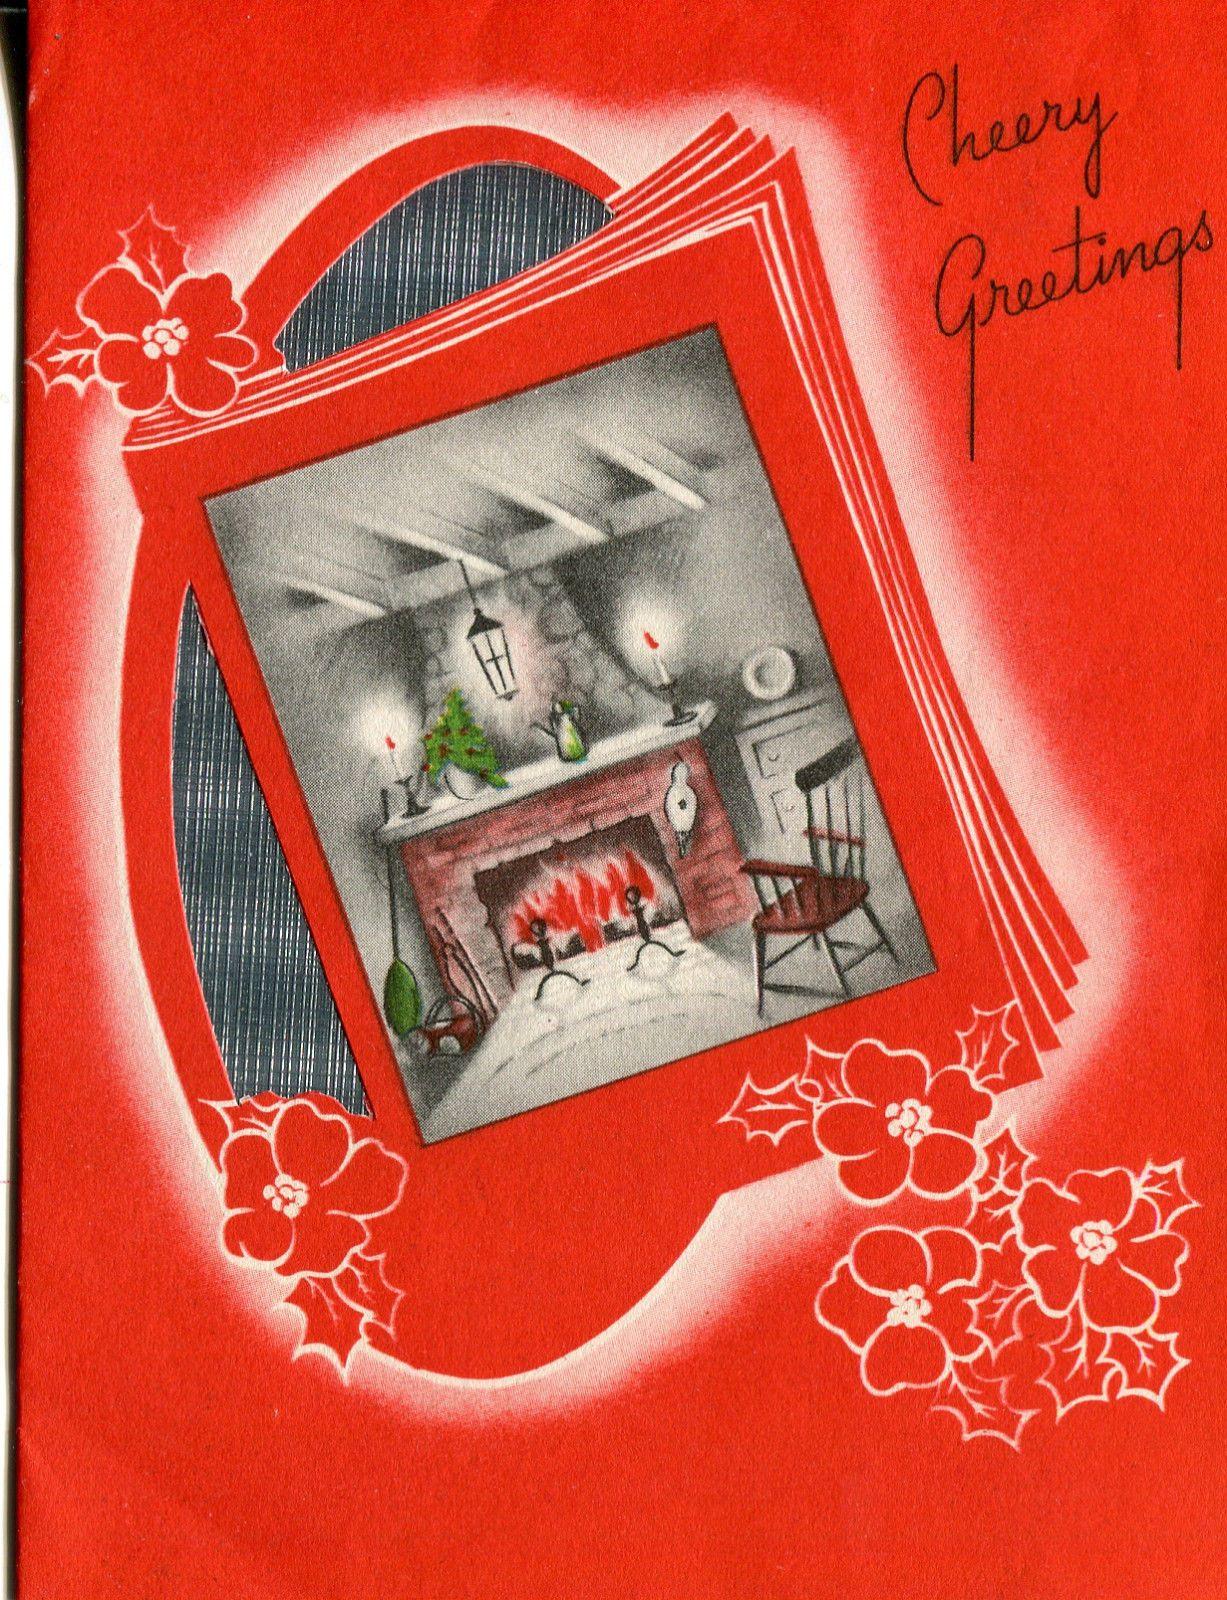 Vintage Art Deco Christmas Card Fireplace Scene with Foil Insert   eBay